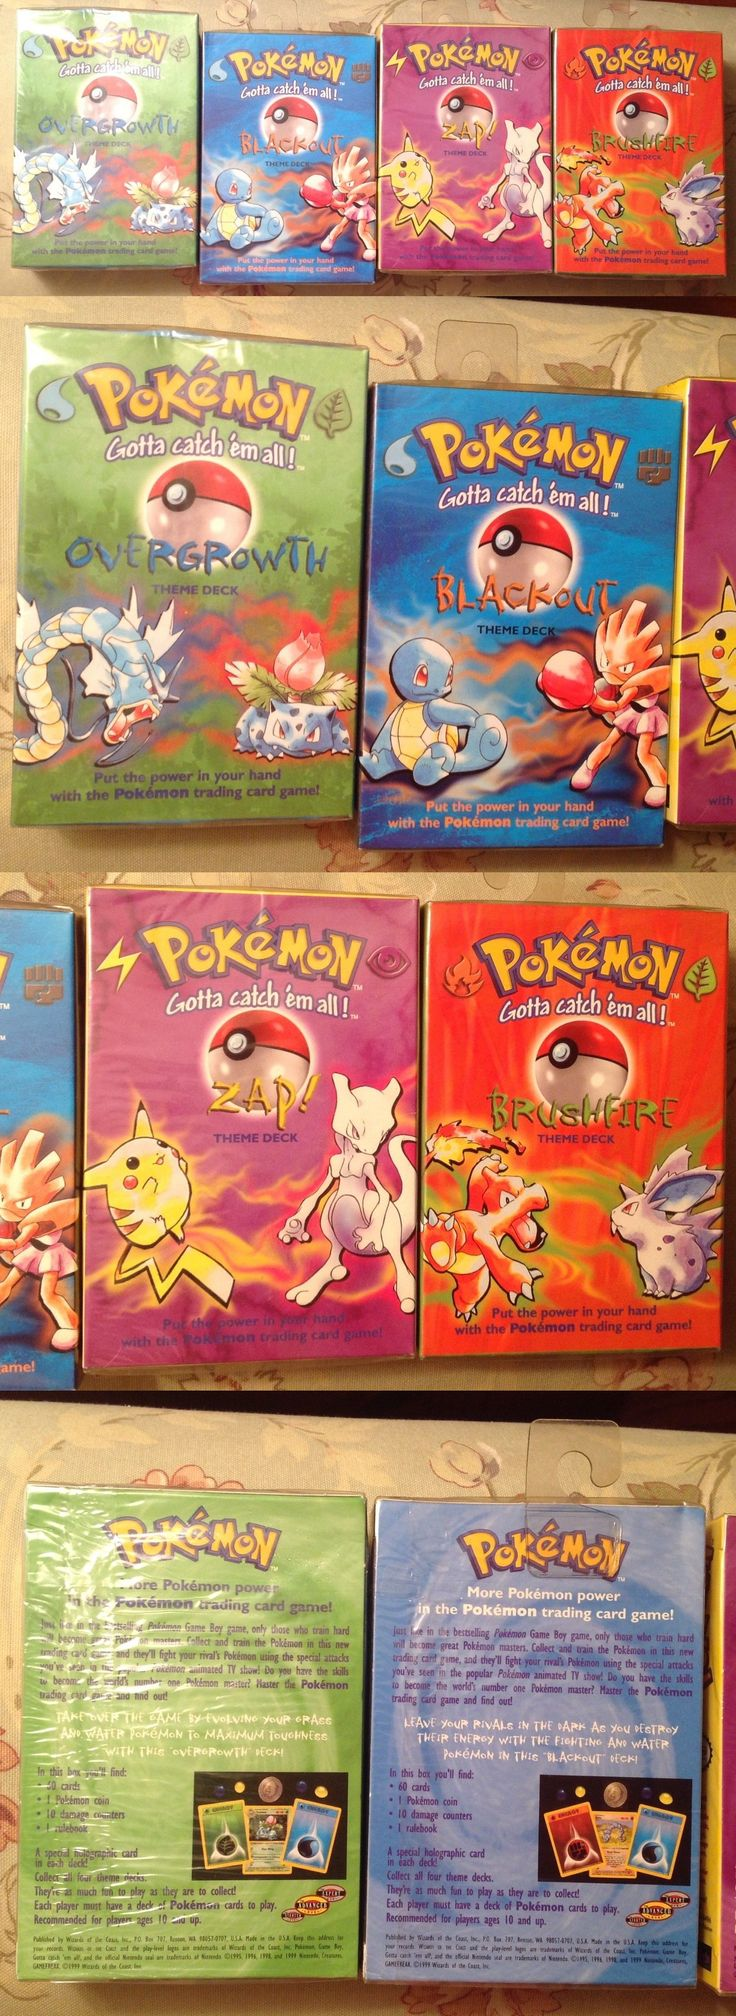 Pok mon Sealed Decks and Kits 183467: 1999 Pokemon Theme Decks, All 4- Overgrowth, Zap, Brushfire, Blackout - Sealed -> BUY IT NOW ONLY: $200 on eBay!